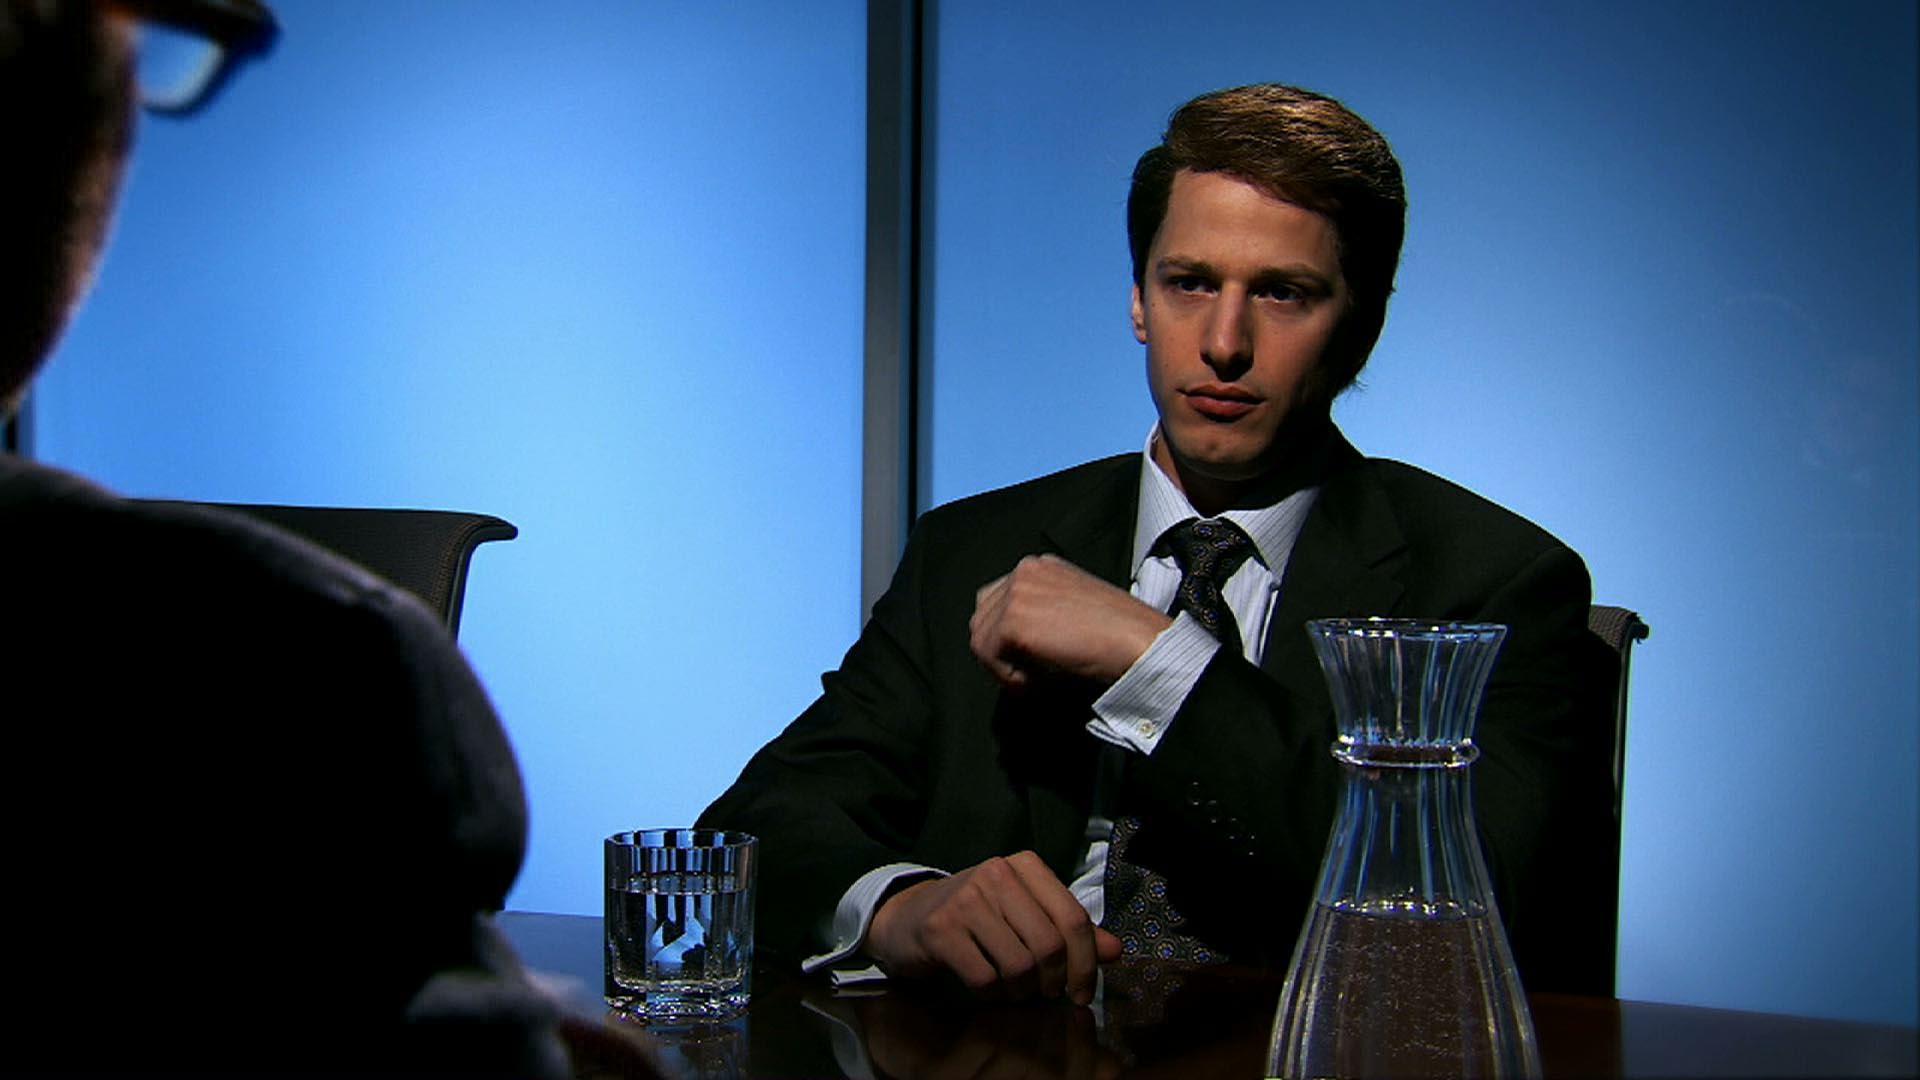 Watch SNL Digital Short Like A Boss From Saturday Night